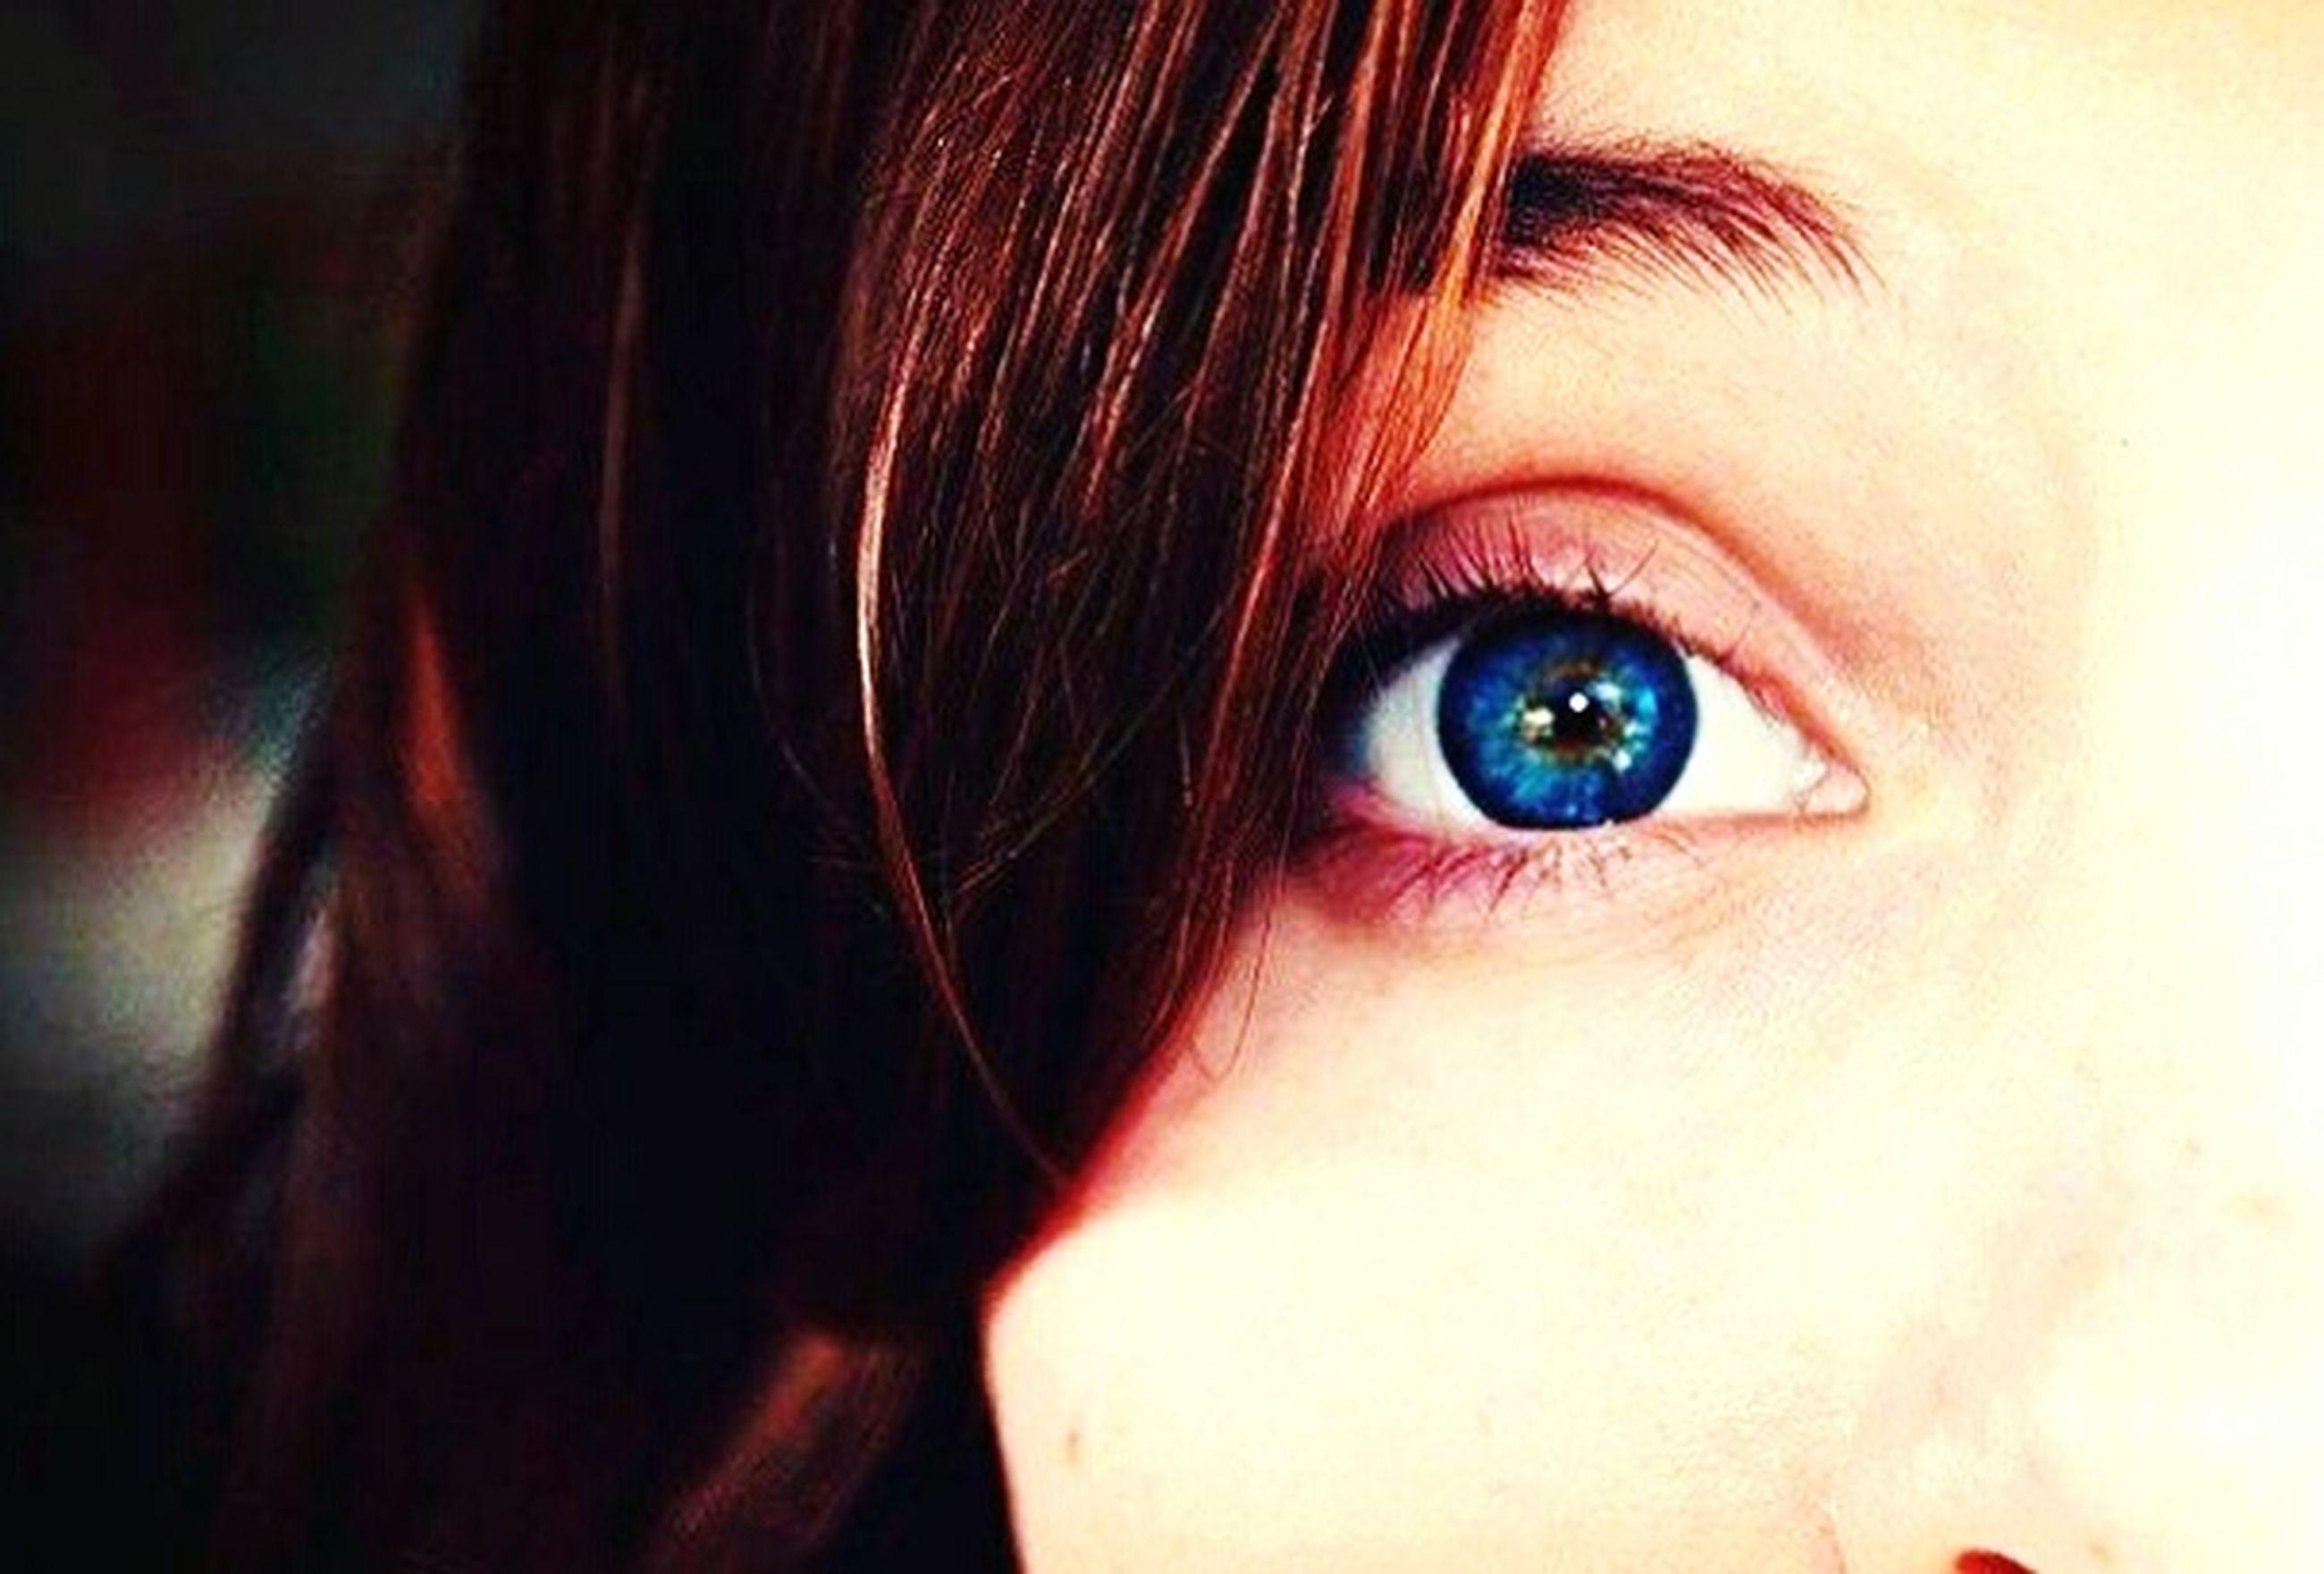 human eye, close-up, looking at camera, human body part, eye, one person, portrait, blue eyes, child, eyebrow, iris - eye, eyelash, eyesight, childhood, people, one teenage girl only, eyeball, adult, young adult, young women, indoors, day